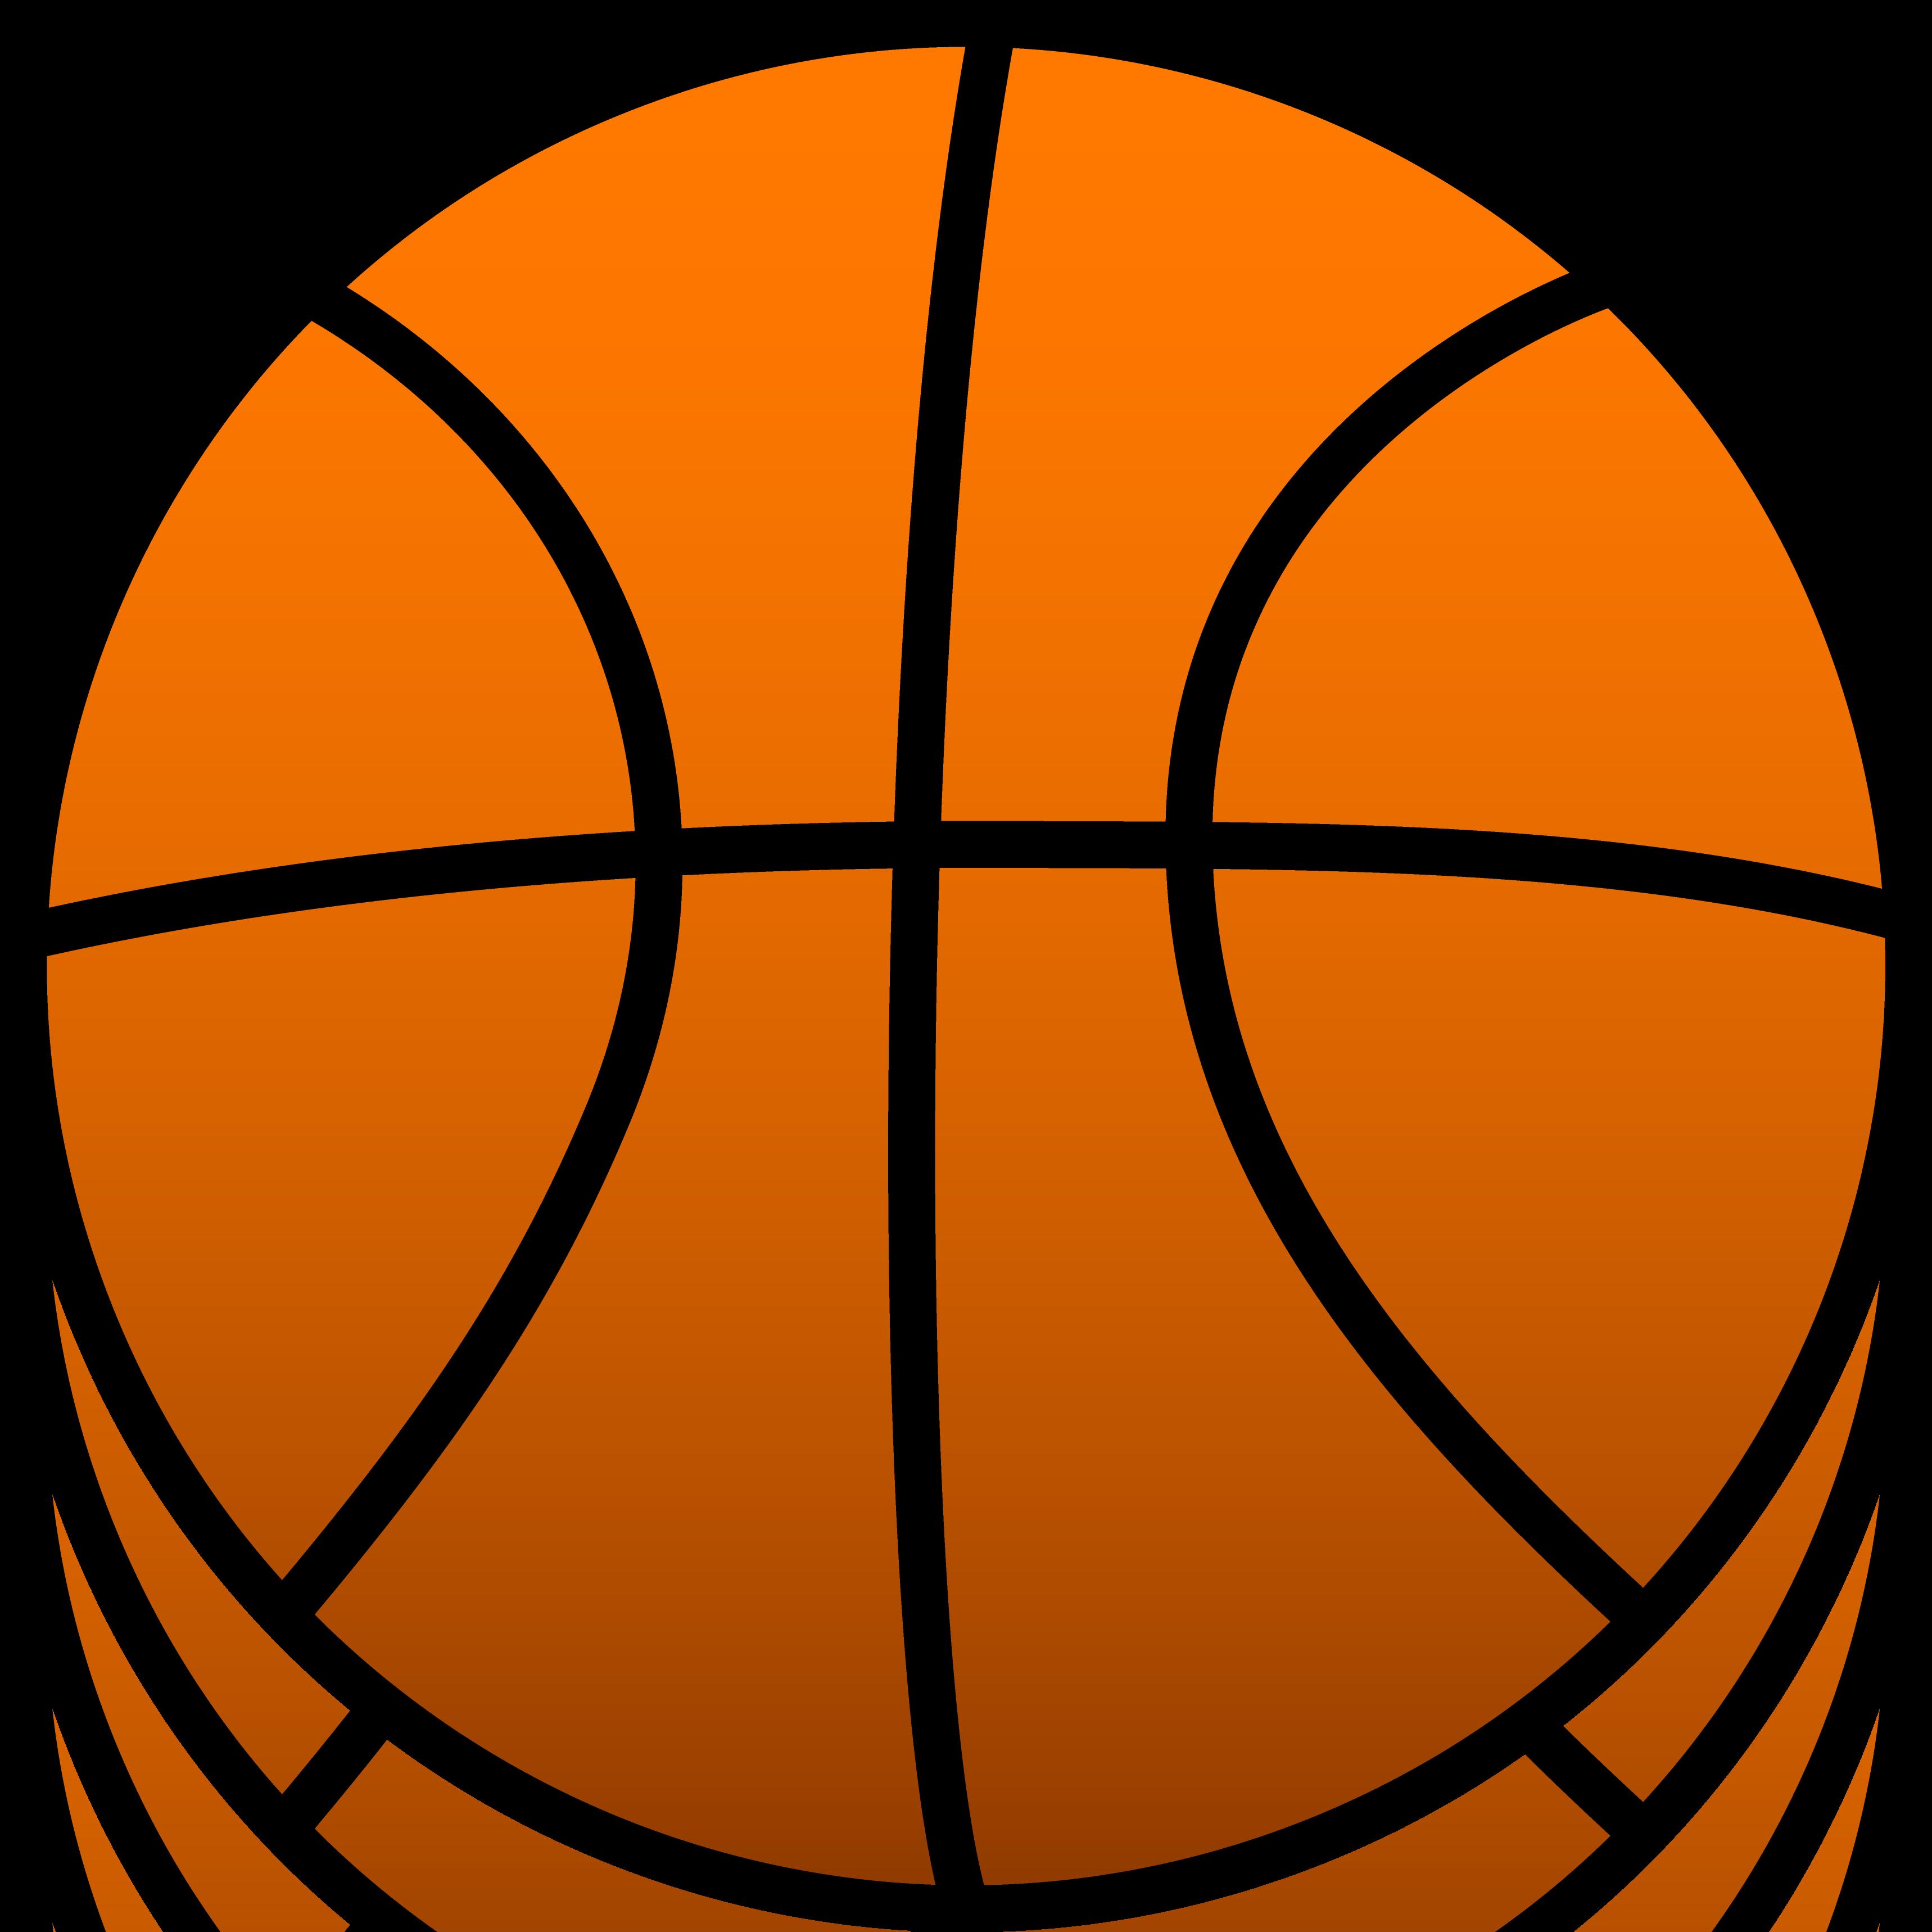 basketball scoreboard clipart-basketball scoreboard clipart-3